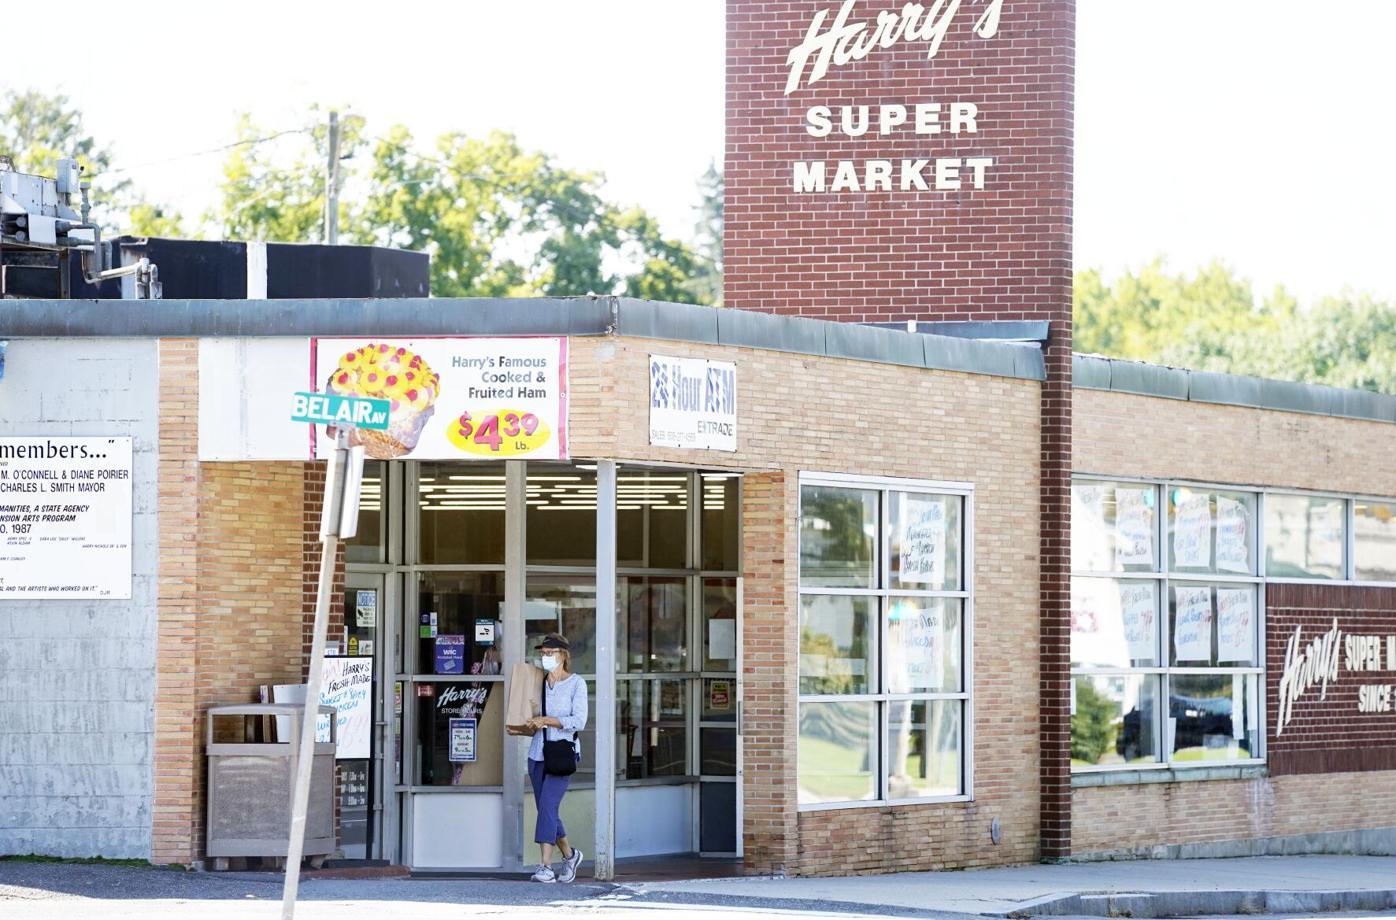 Harry's Supermarket exterior